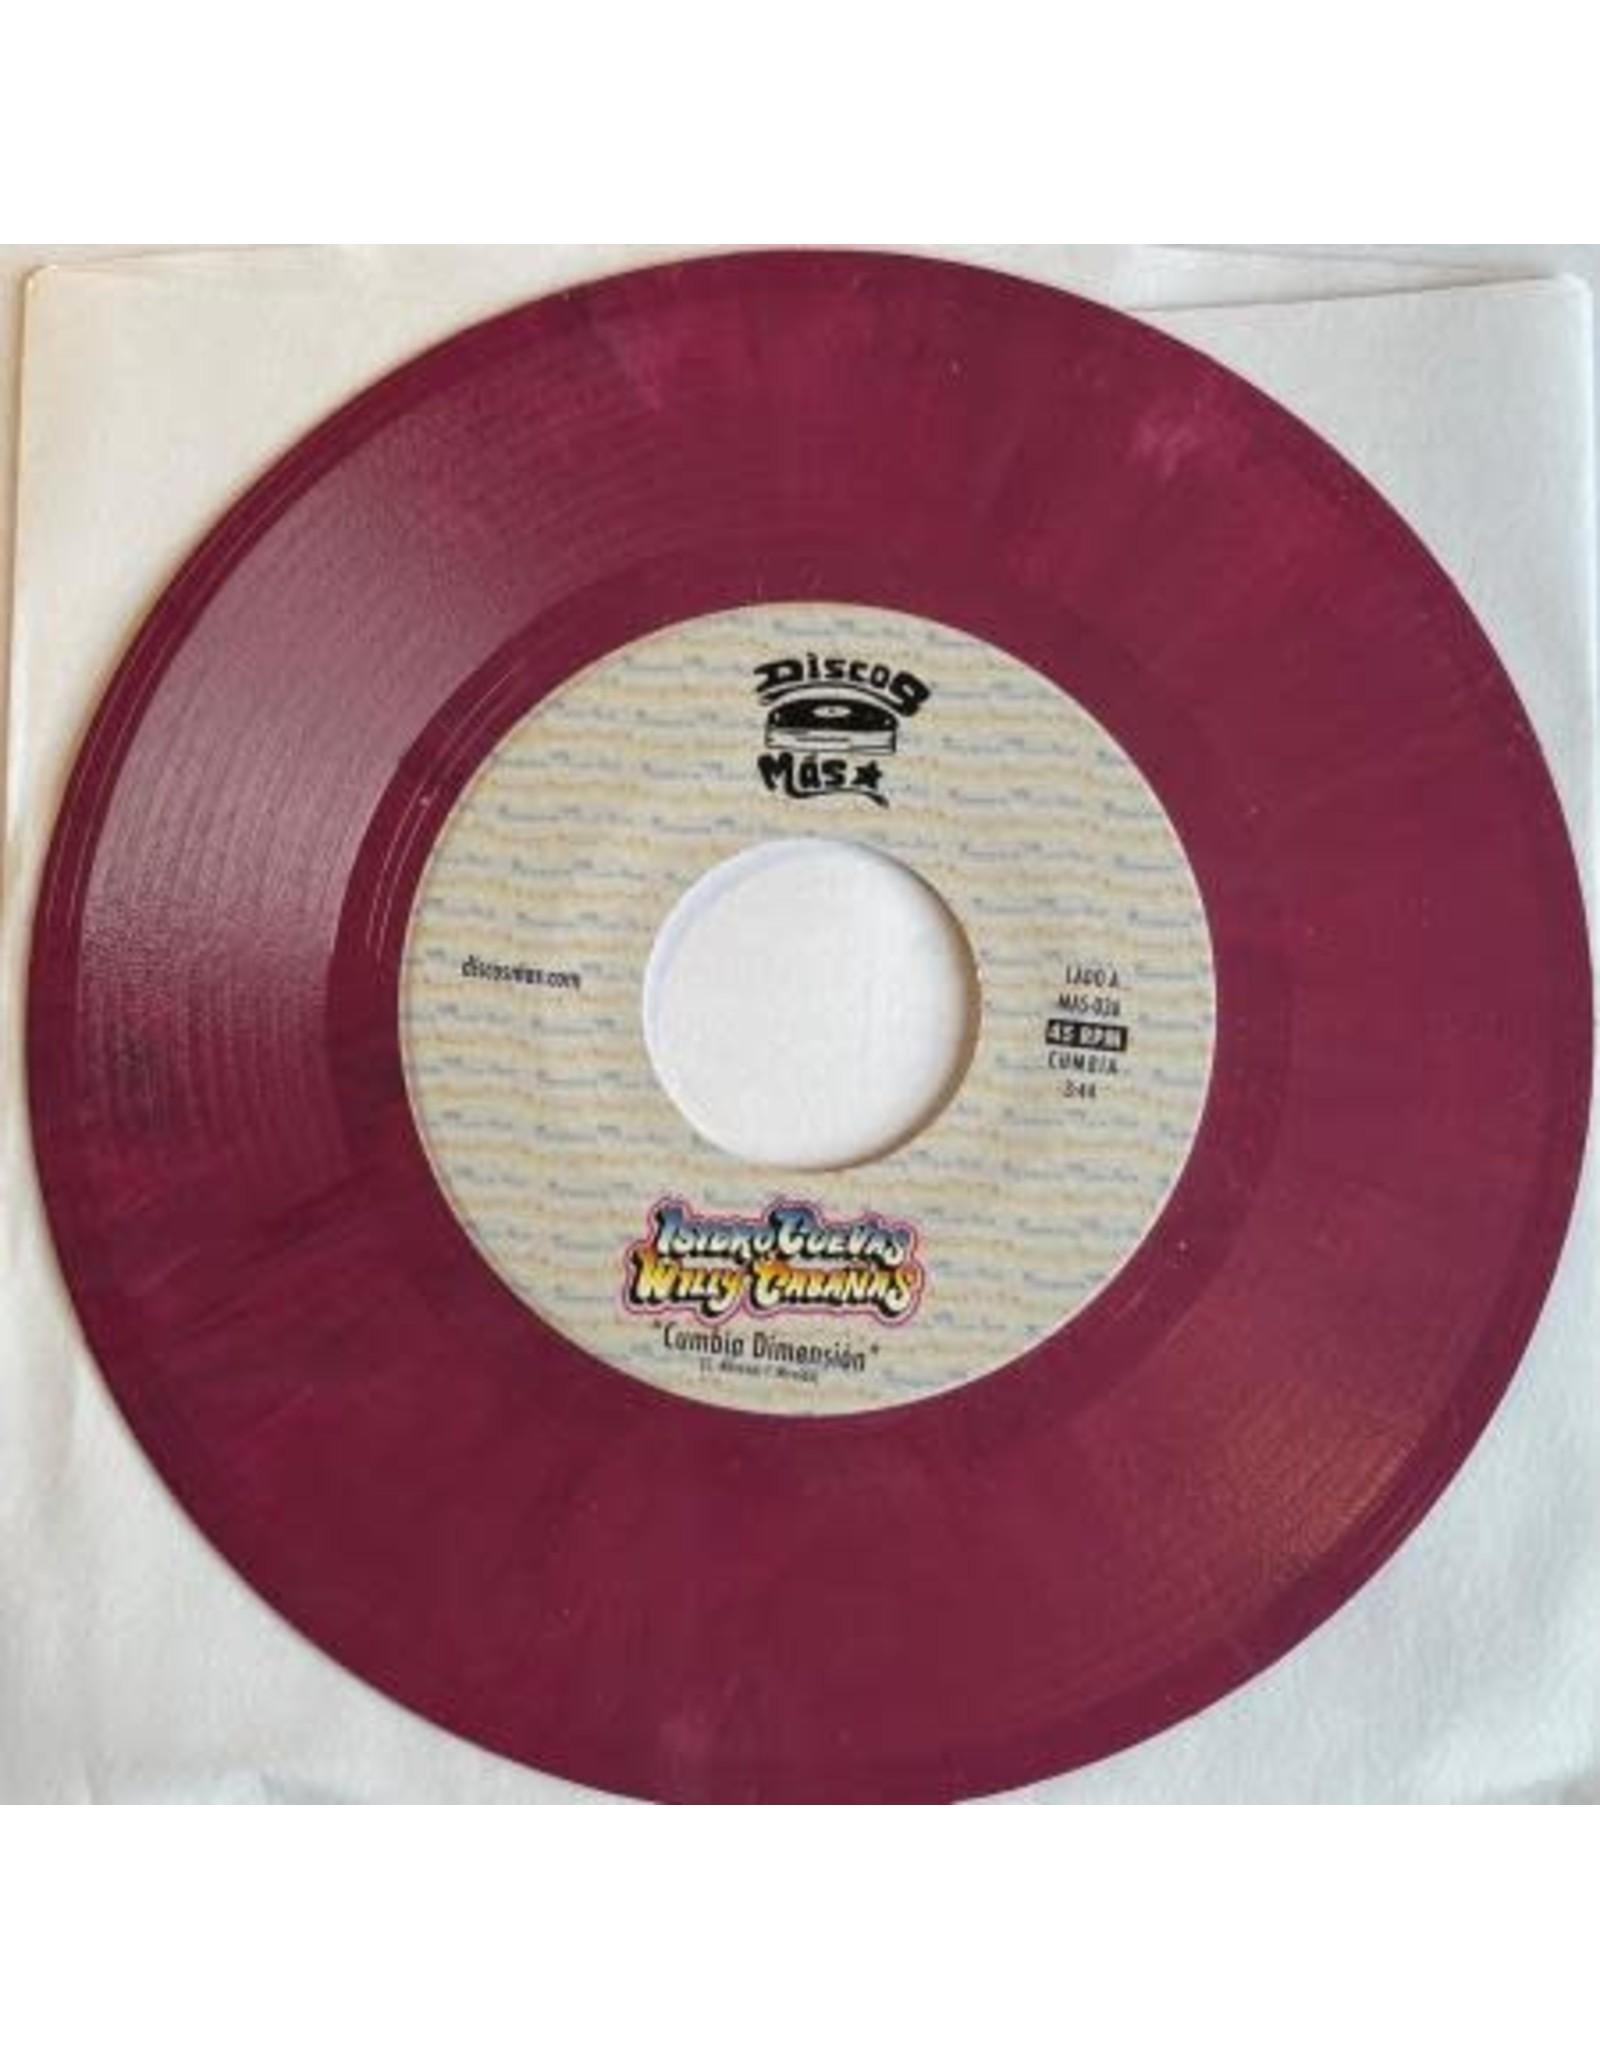 "New Vinyl Isidro Cuevas y Willie Cabañas - Cumbia Dimension / Tu Selva 7"""